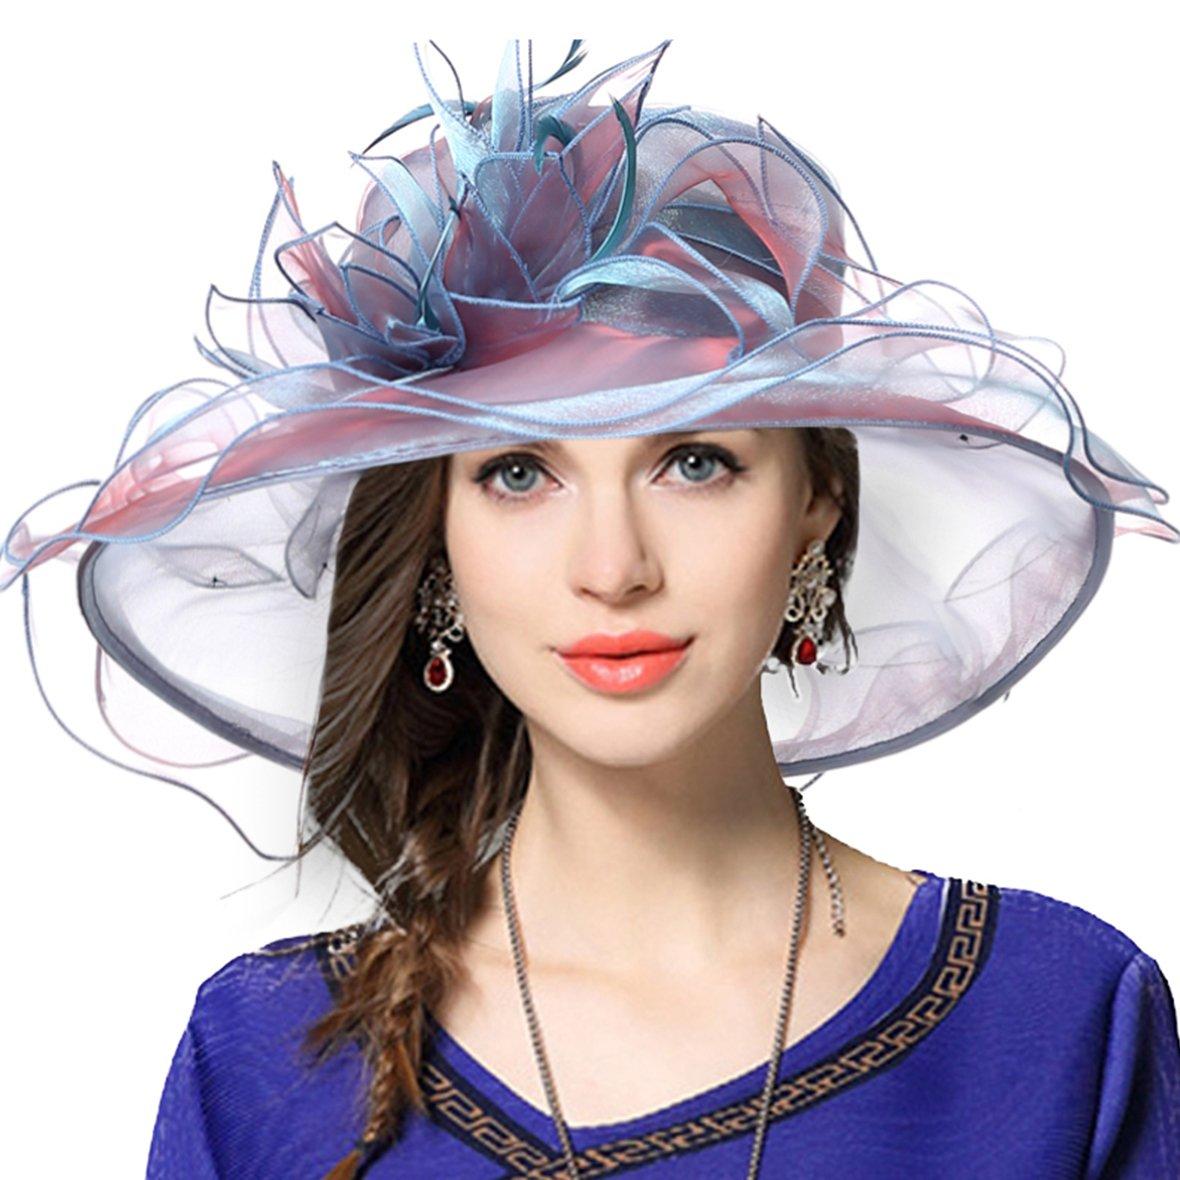 Women's Church Derby Dress Fascinator Bridal Cap British Tea Party Wedding Hat (Plain-Aqua)